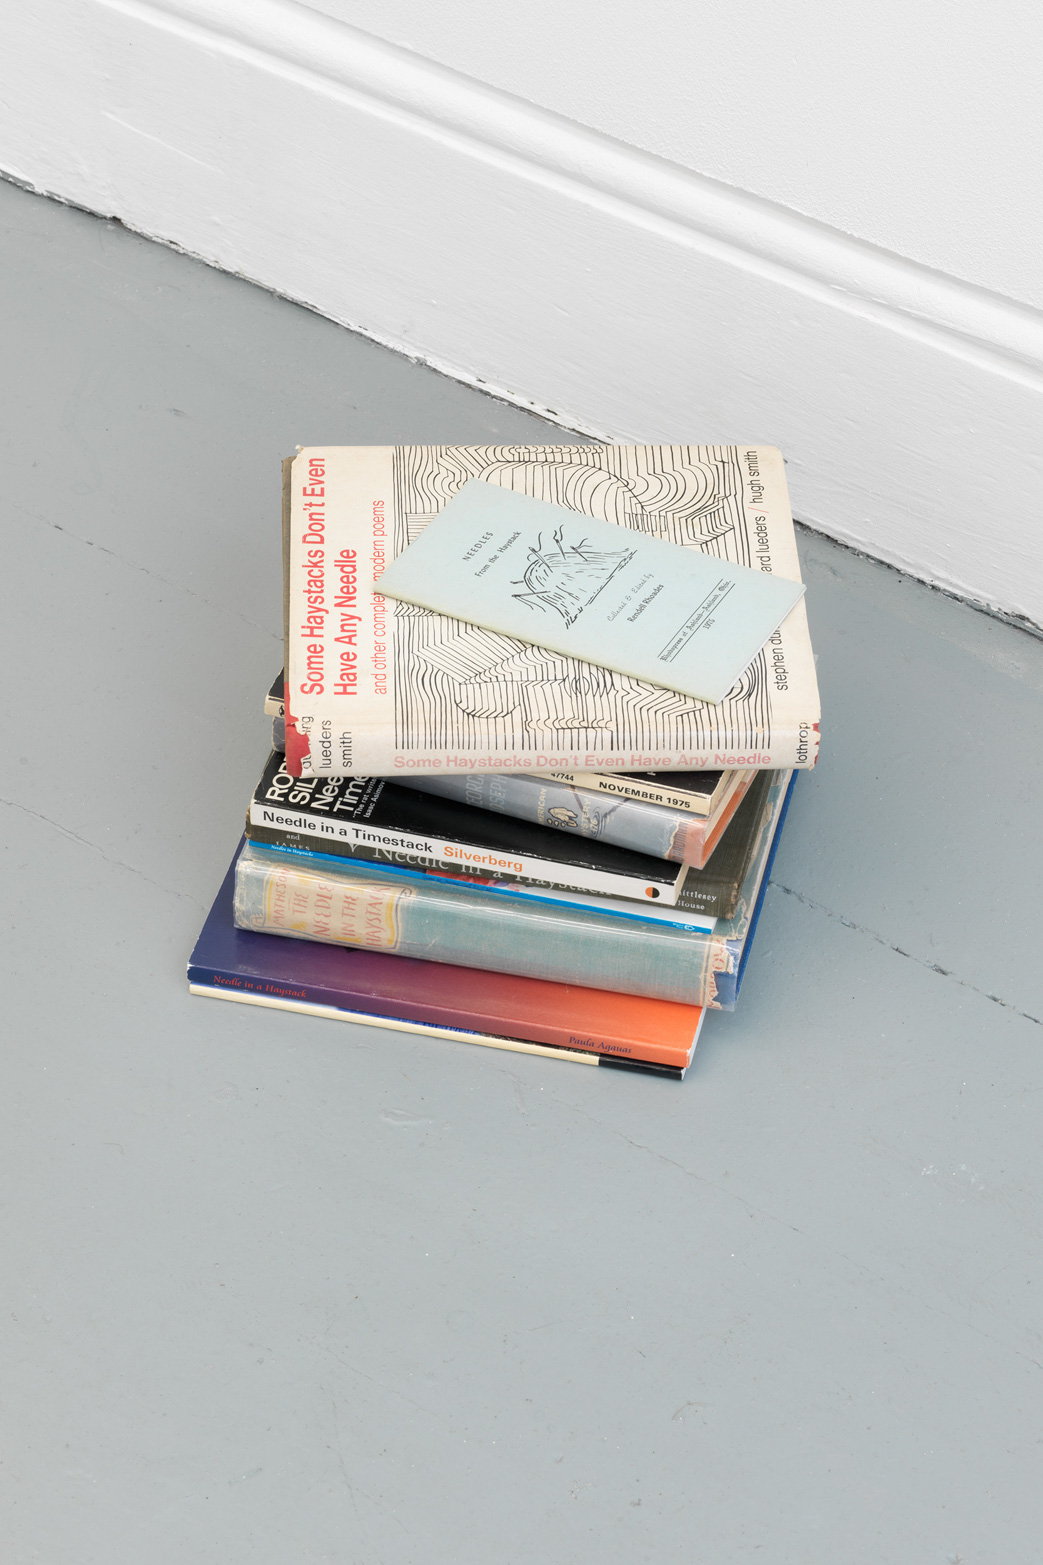 Yann Sérandour  Bookstack, 2005.  Tenderpixel.